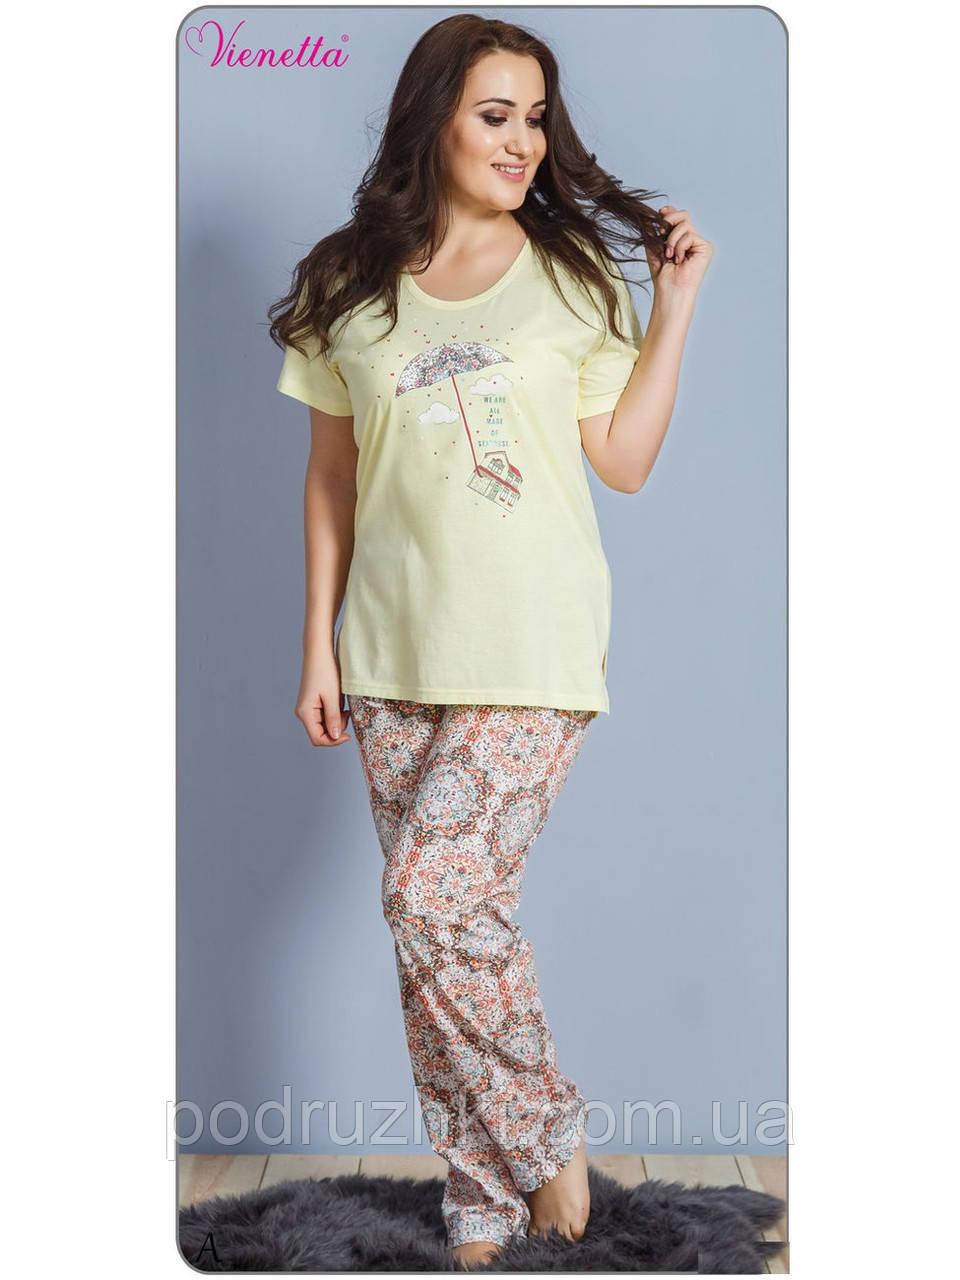 810c401c051b7 Домашний комплект женский (пижама) VIENETTA - Интернет-магазин